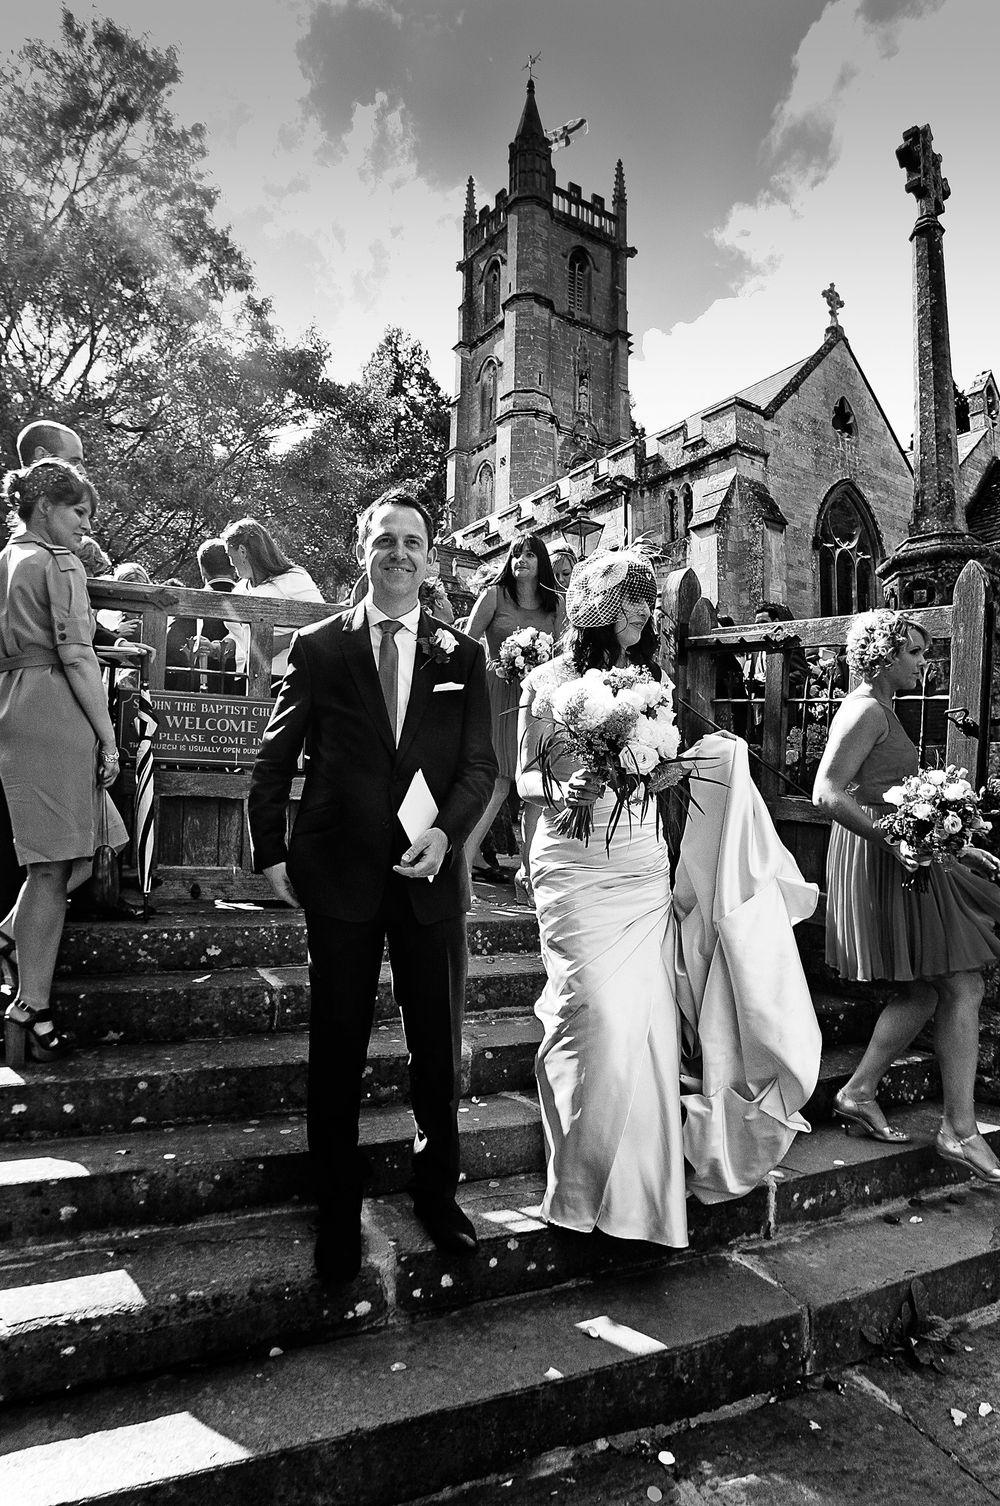 Phwp_Paul-Hames-Wedding-Photographer_A&B174.jpg